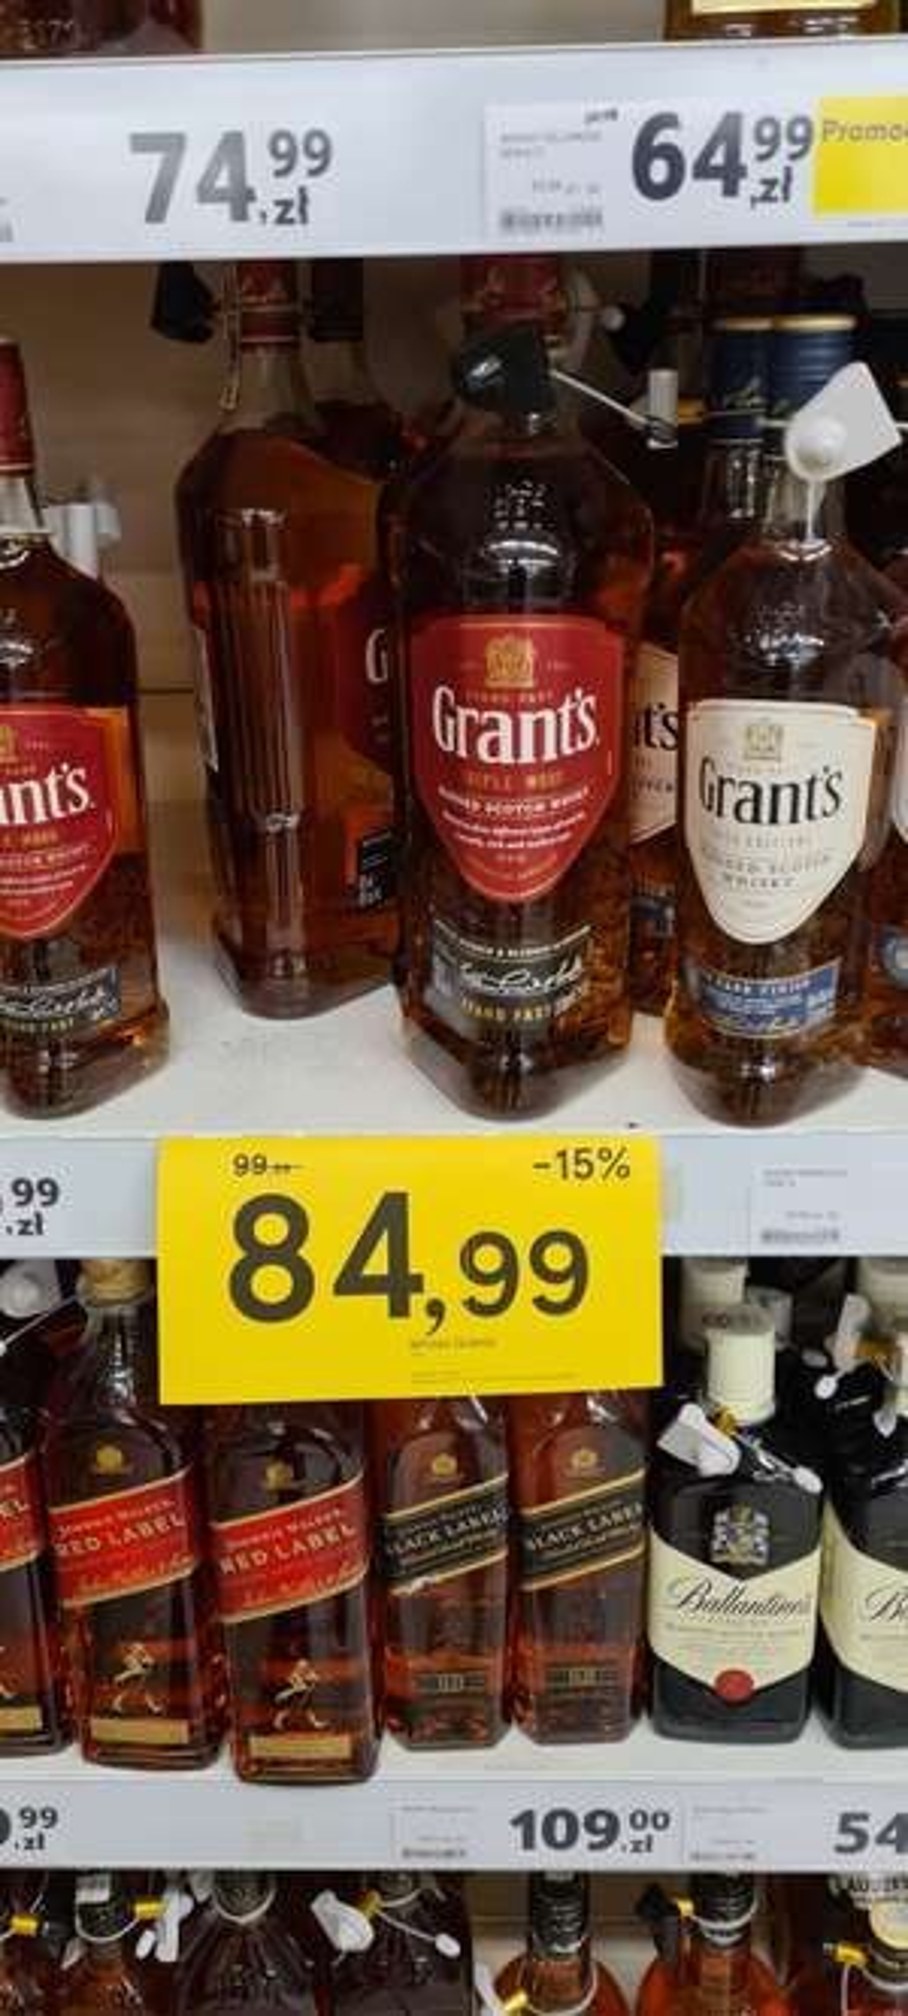 Whisky Grants 1.5l